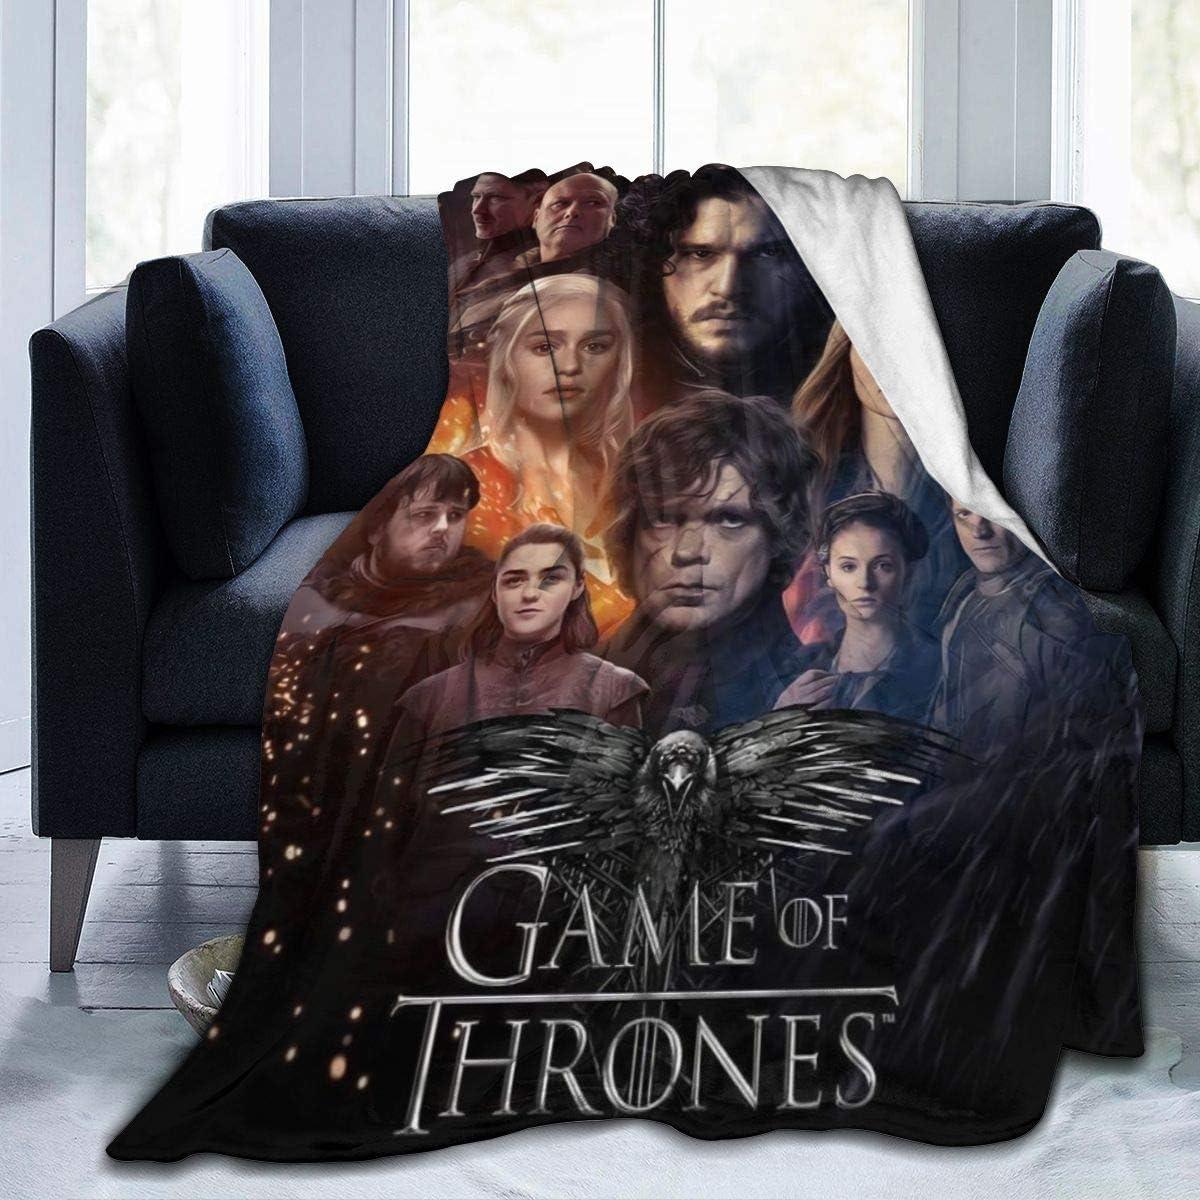 Game of-Thrones Decorative Bedspread Throw Blanket